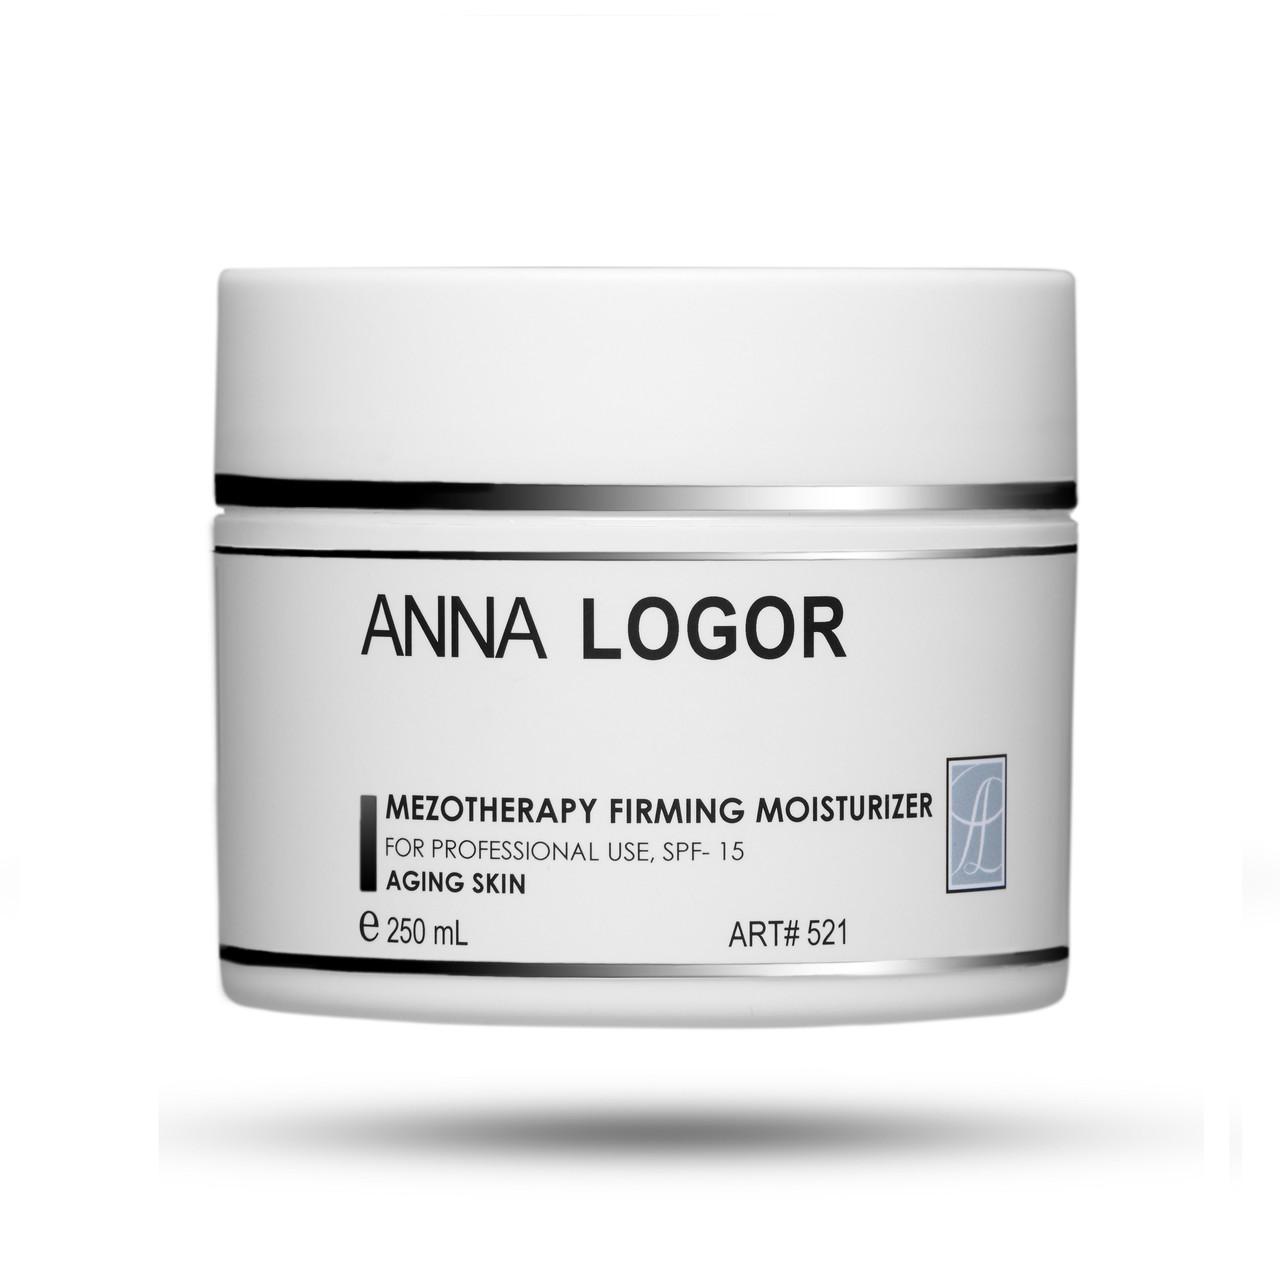 Крем денний омолоджуючий Анна Логор - Anna Logor Mezotherapy Firming Moisturizer 250 ml Art.521